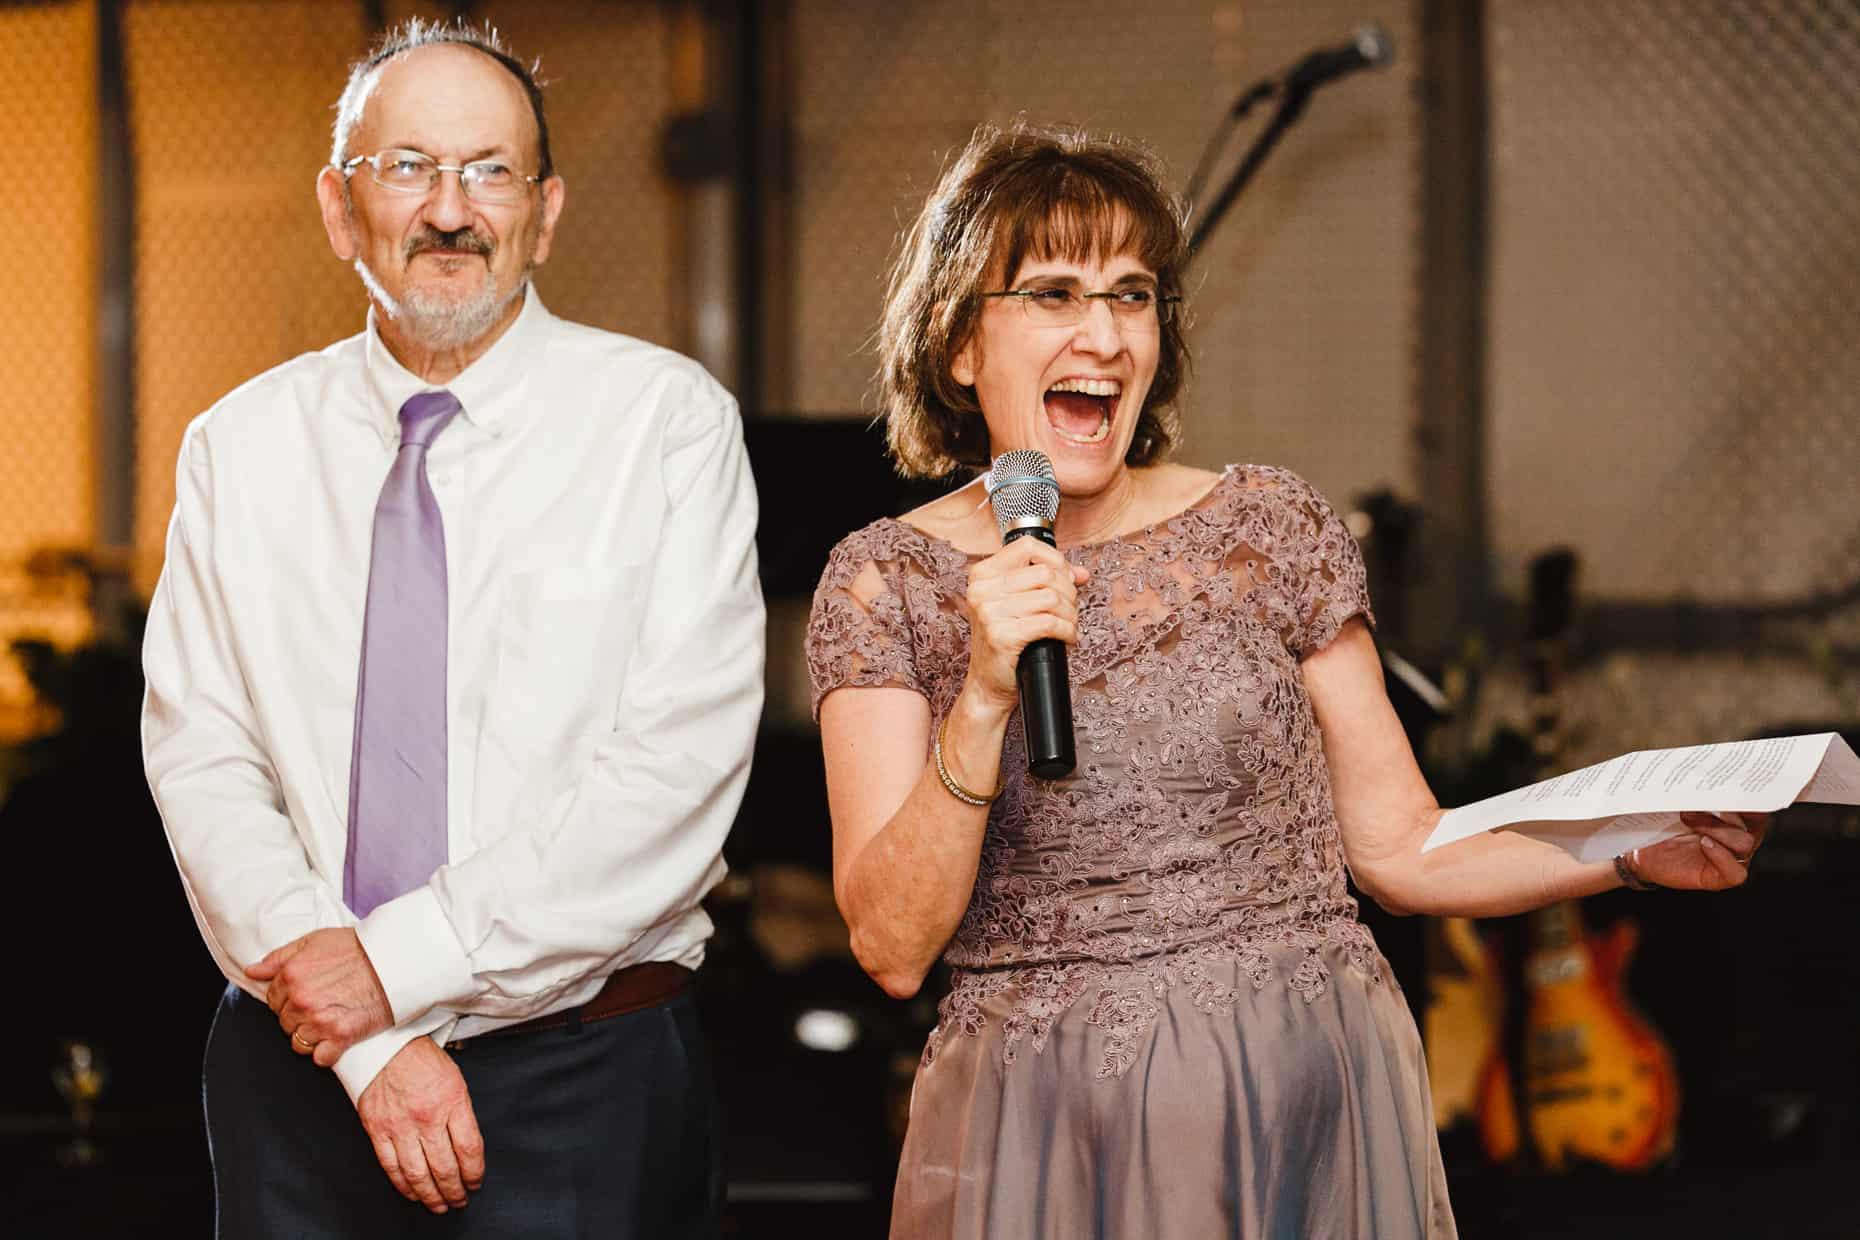 West Philadelphia Wedding Photo